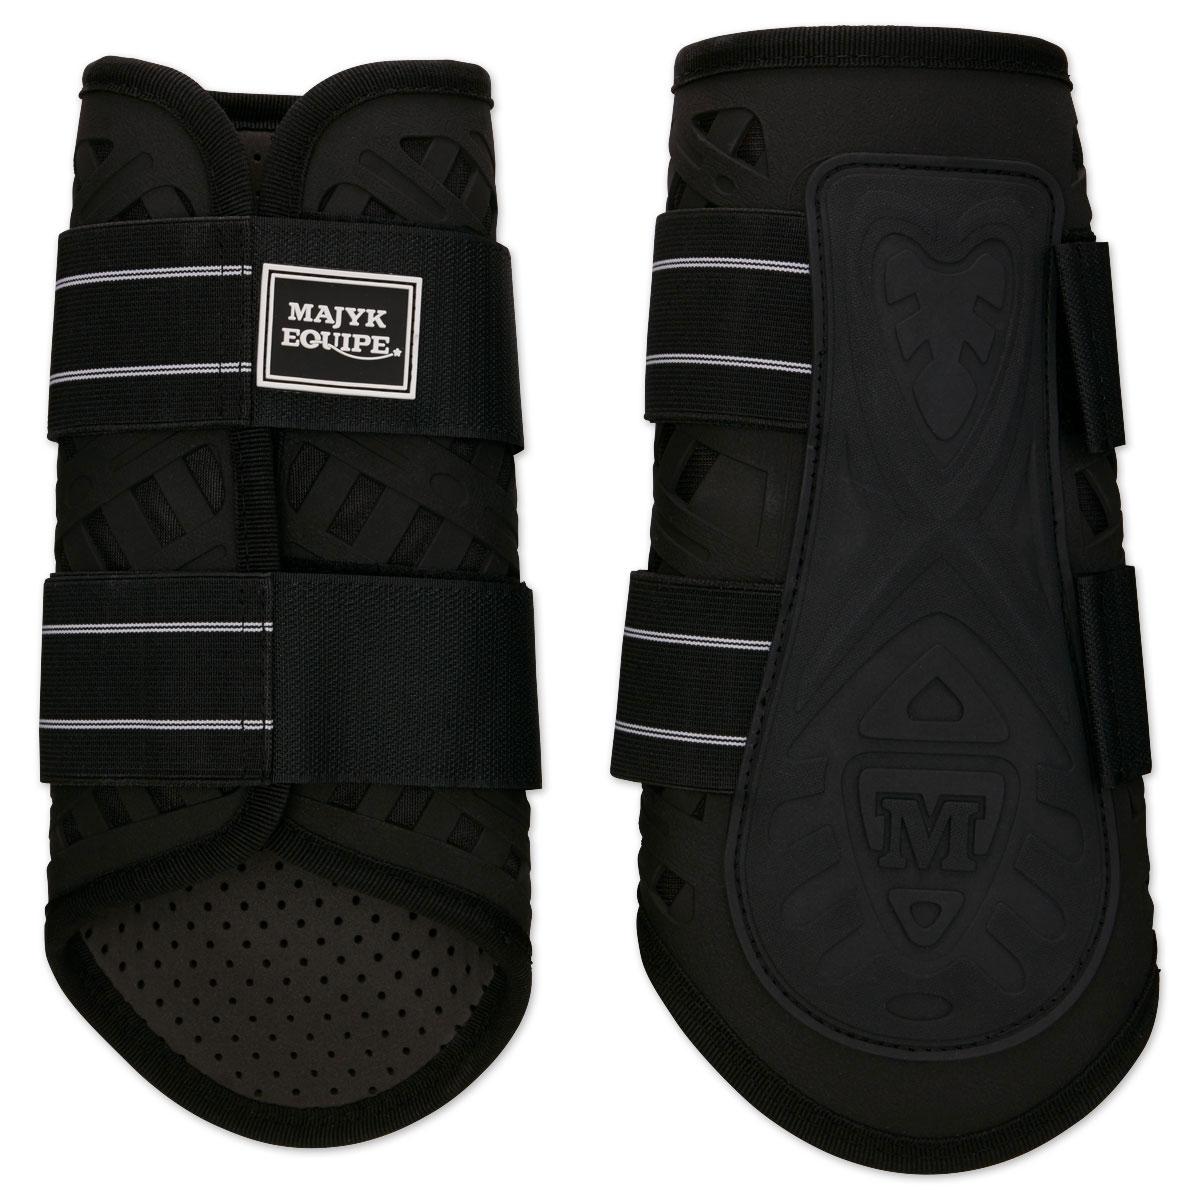 Majyk Equipe Sport/Dressage Boot